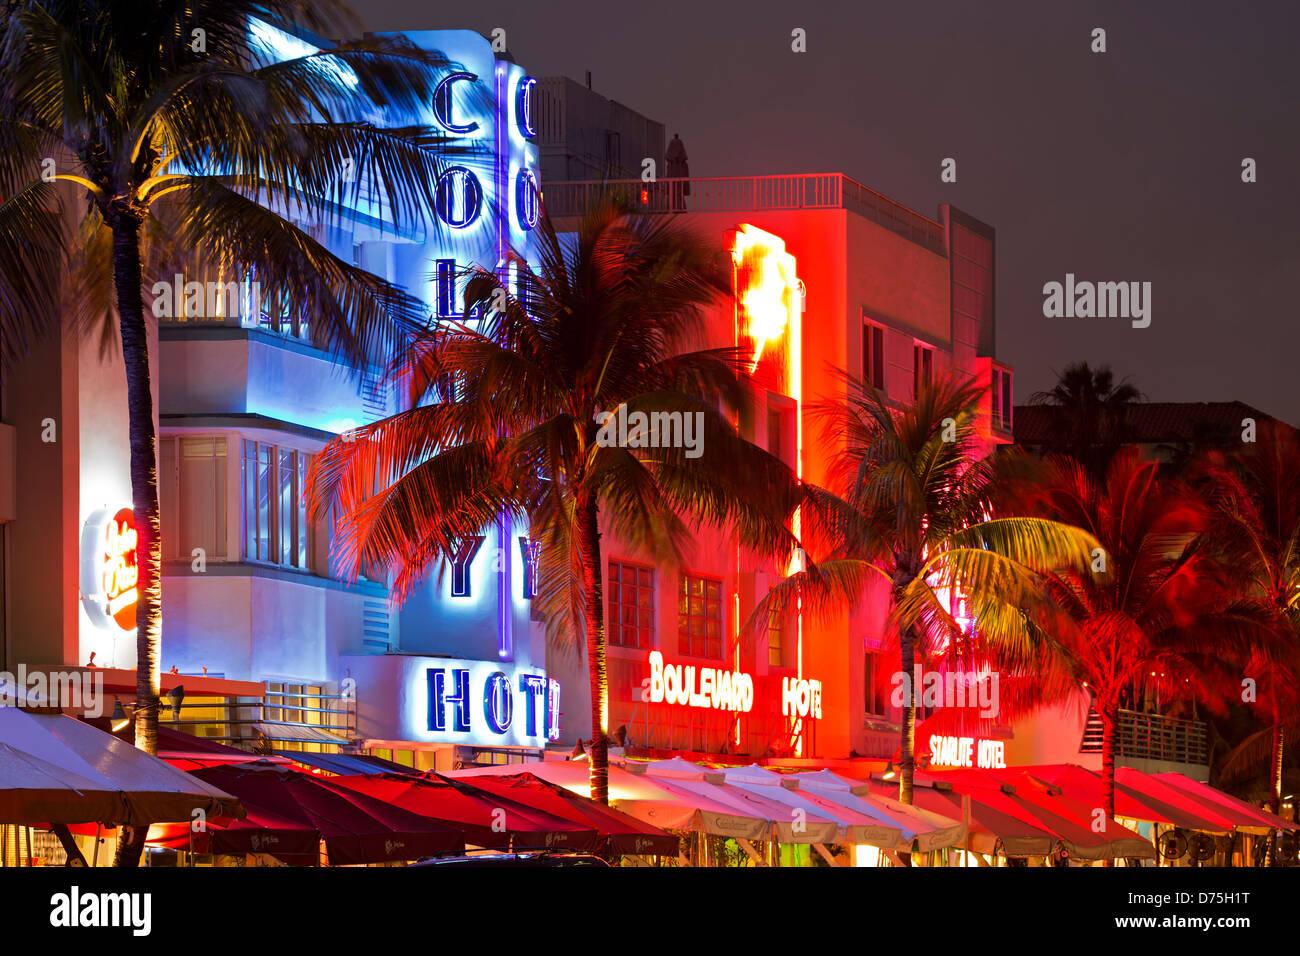 Row of hotels, Colony Hotel, South Beach, Miami Beach, Florida USA - Stock Image